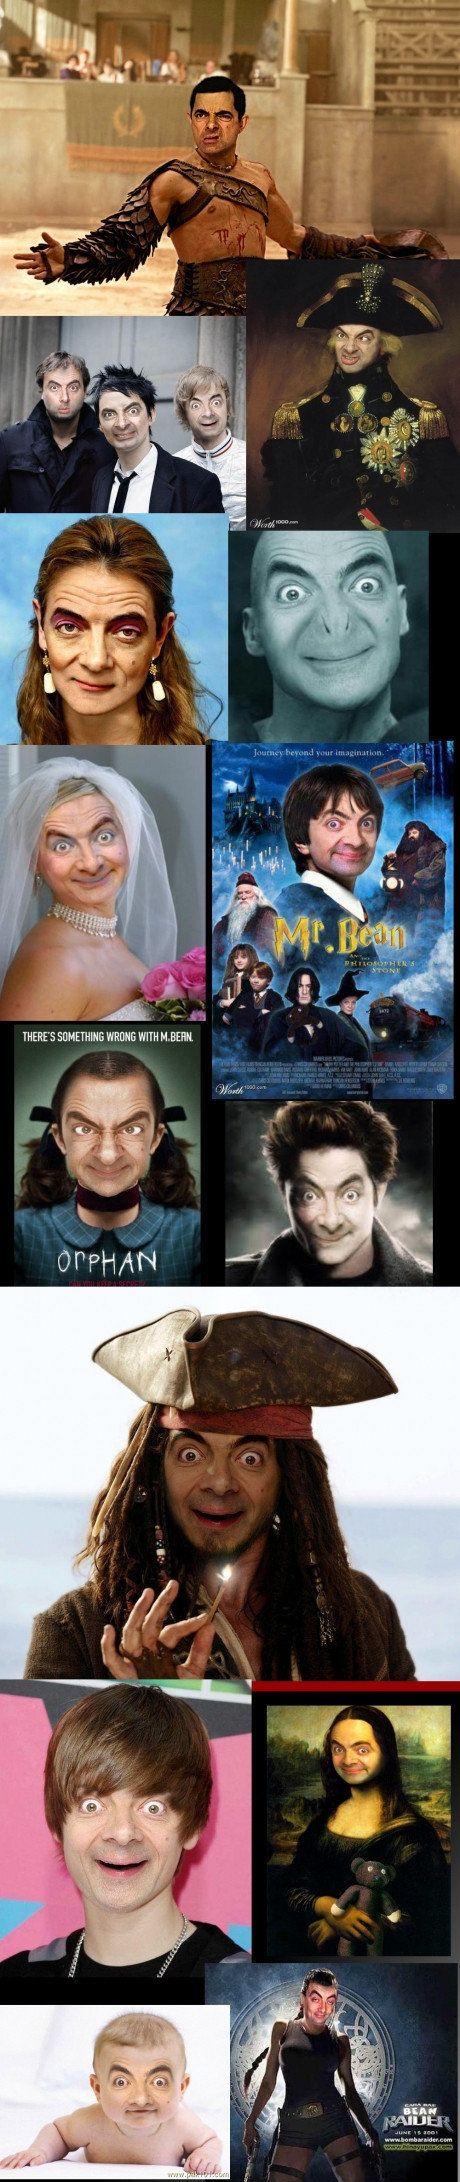 Mr. Bean face swap